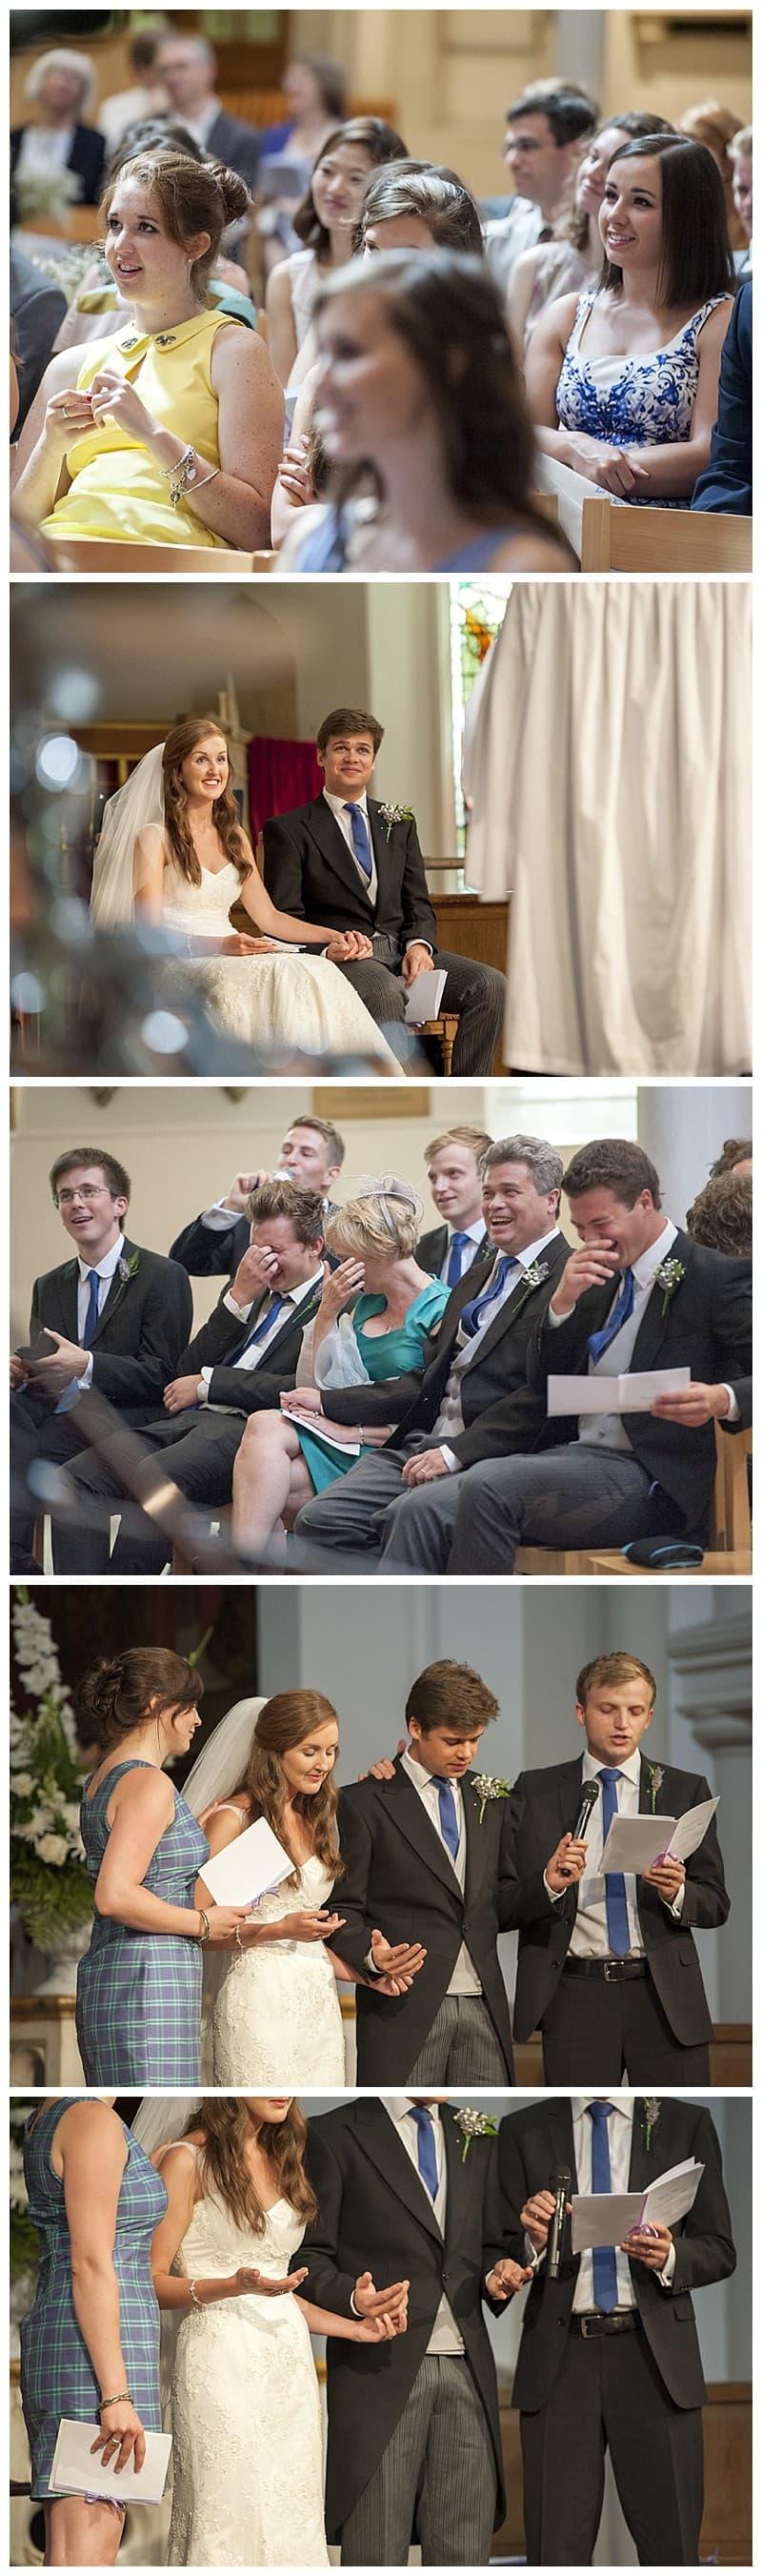 Dan & Rachel, Hyde Park, Kensington Wedding, Benjamin Wetherall Photography0020